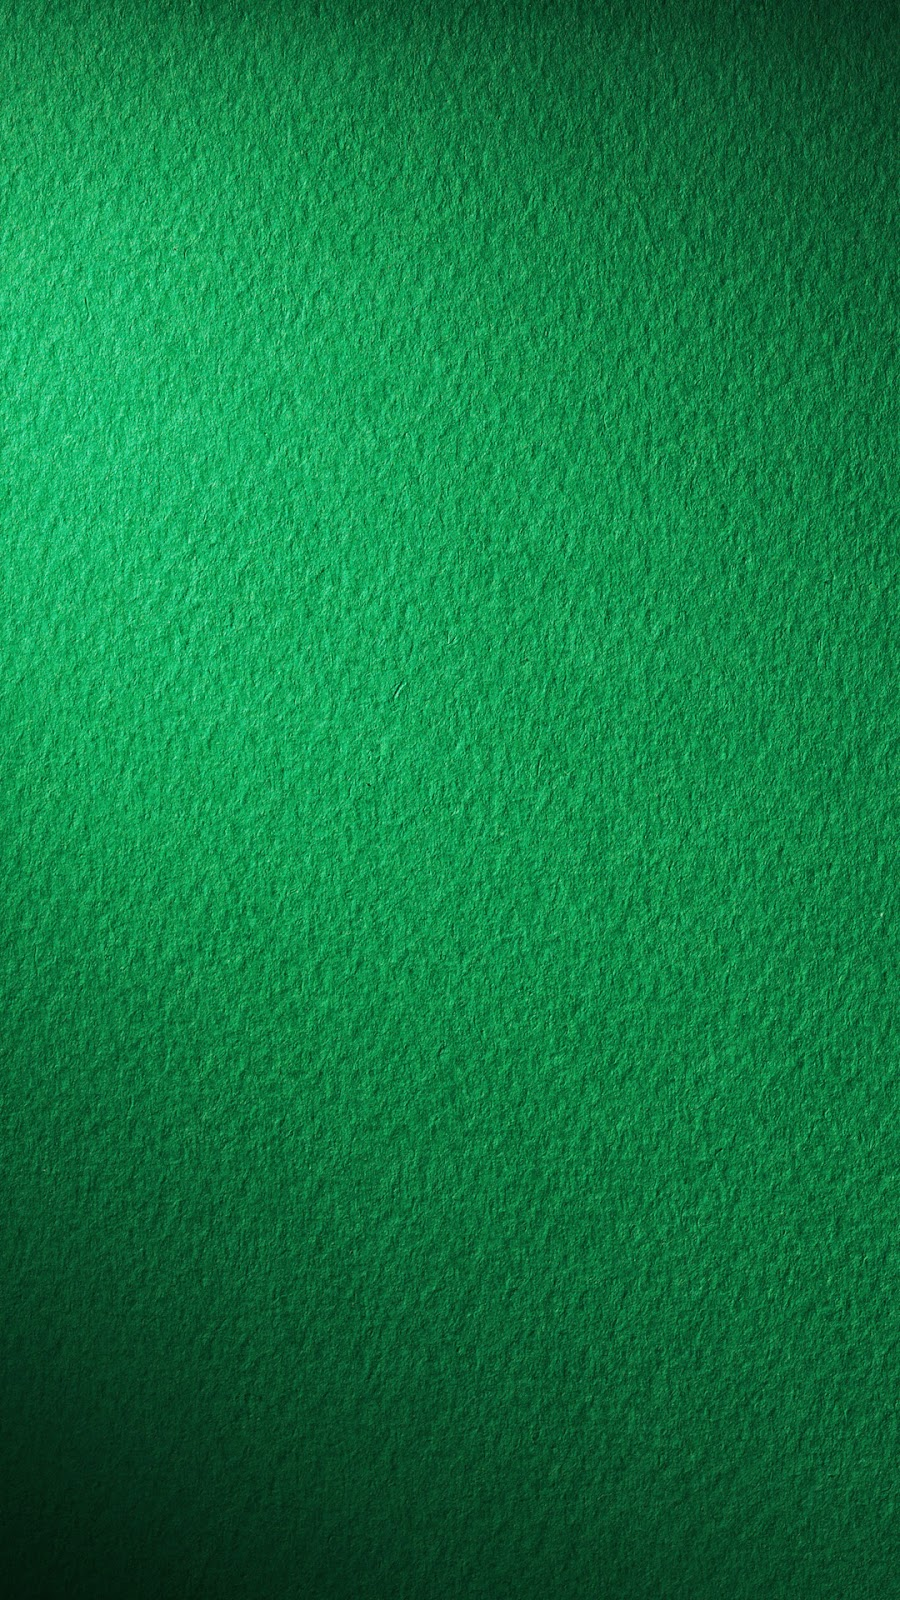 Hd wallpaper vivo - Vivo X5 Max Stock Wallpapers 14